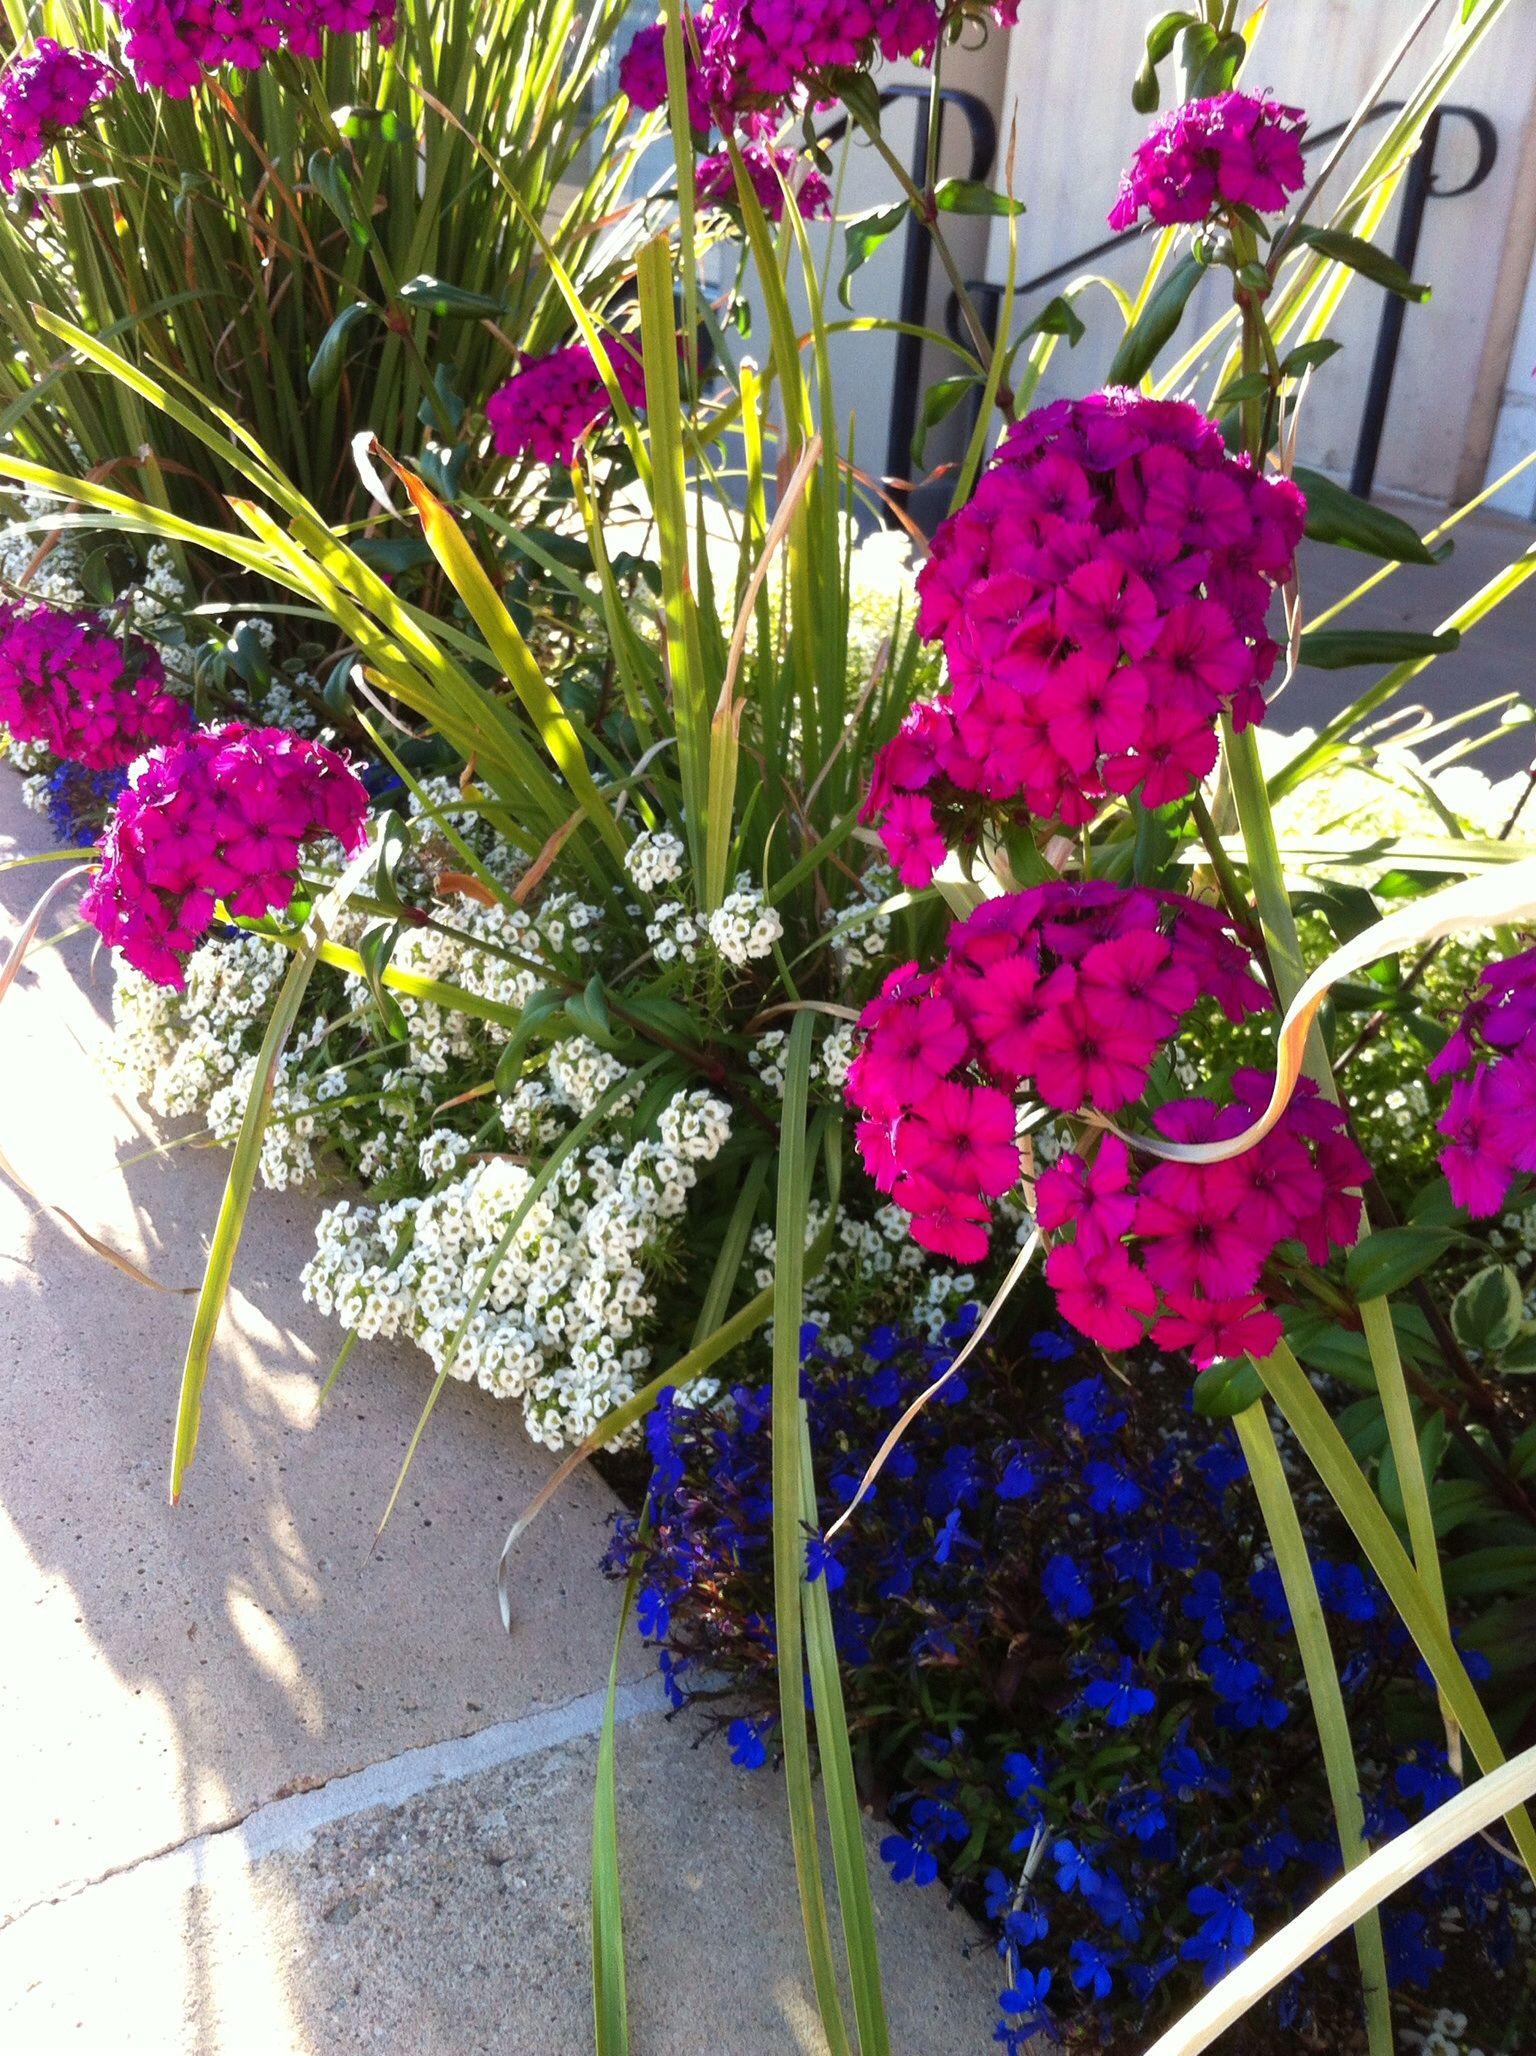 Tucson Winter Flowers La Encantada Flower